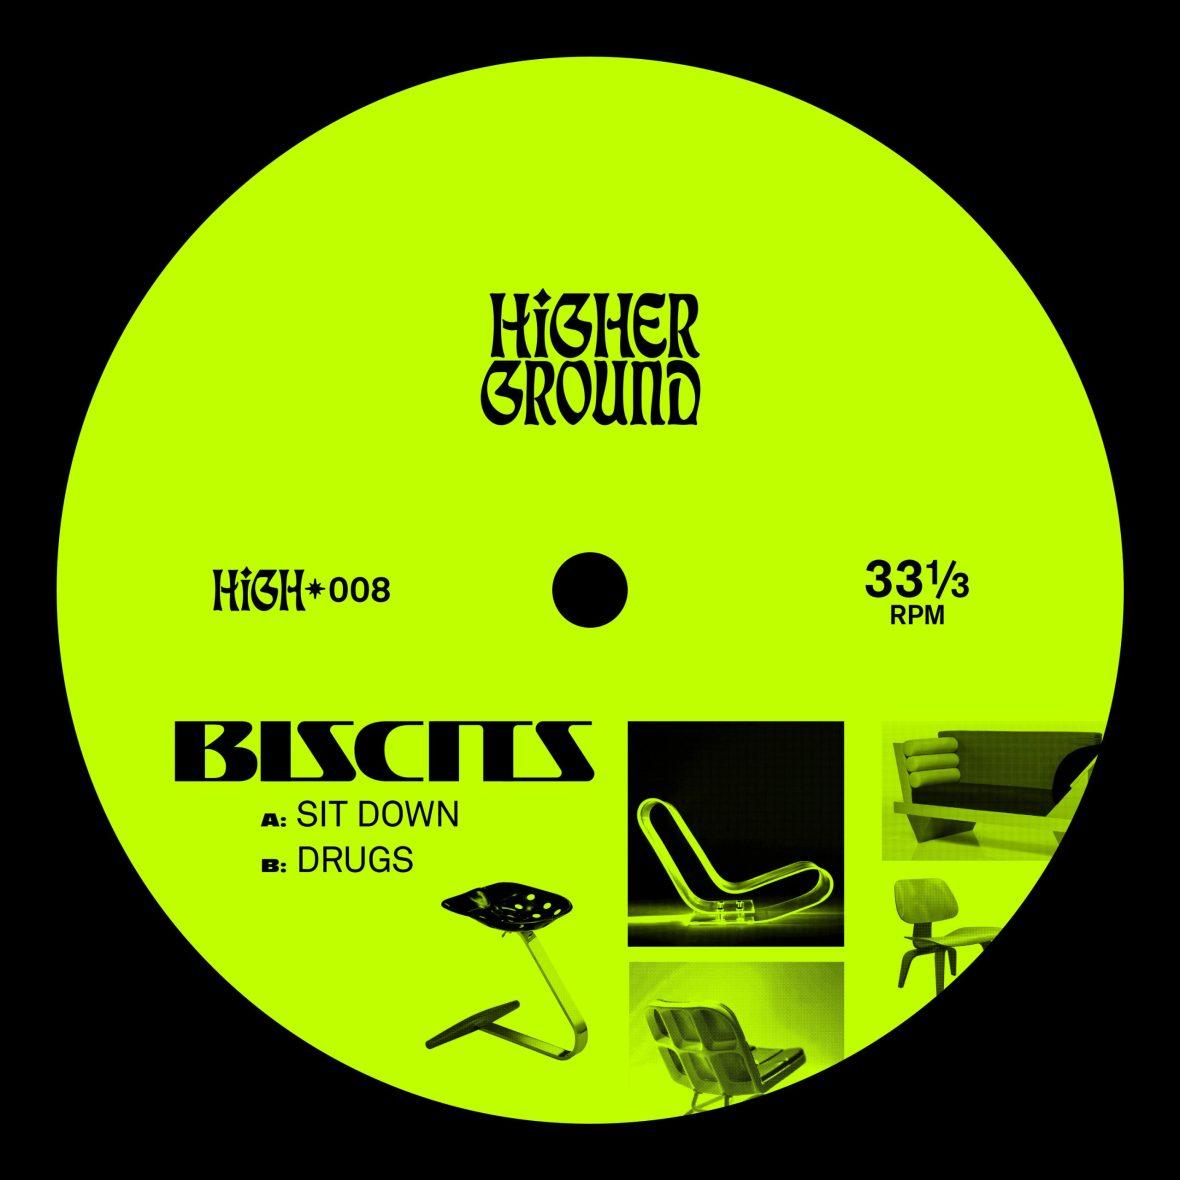 Southampton House Producer Biscits Releases New 'Sit Down' EP via Higher Ground ile ilgili görsel sonucu